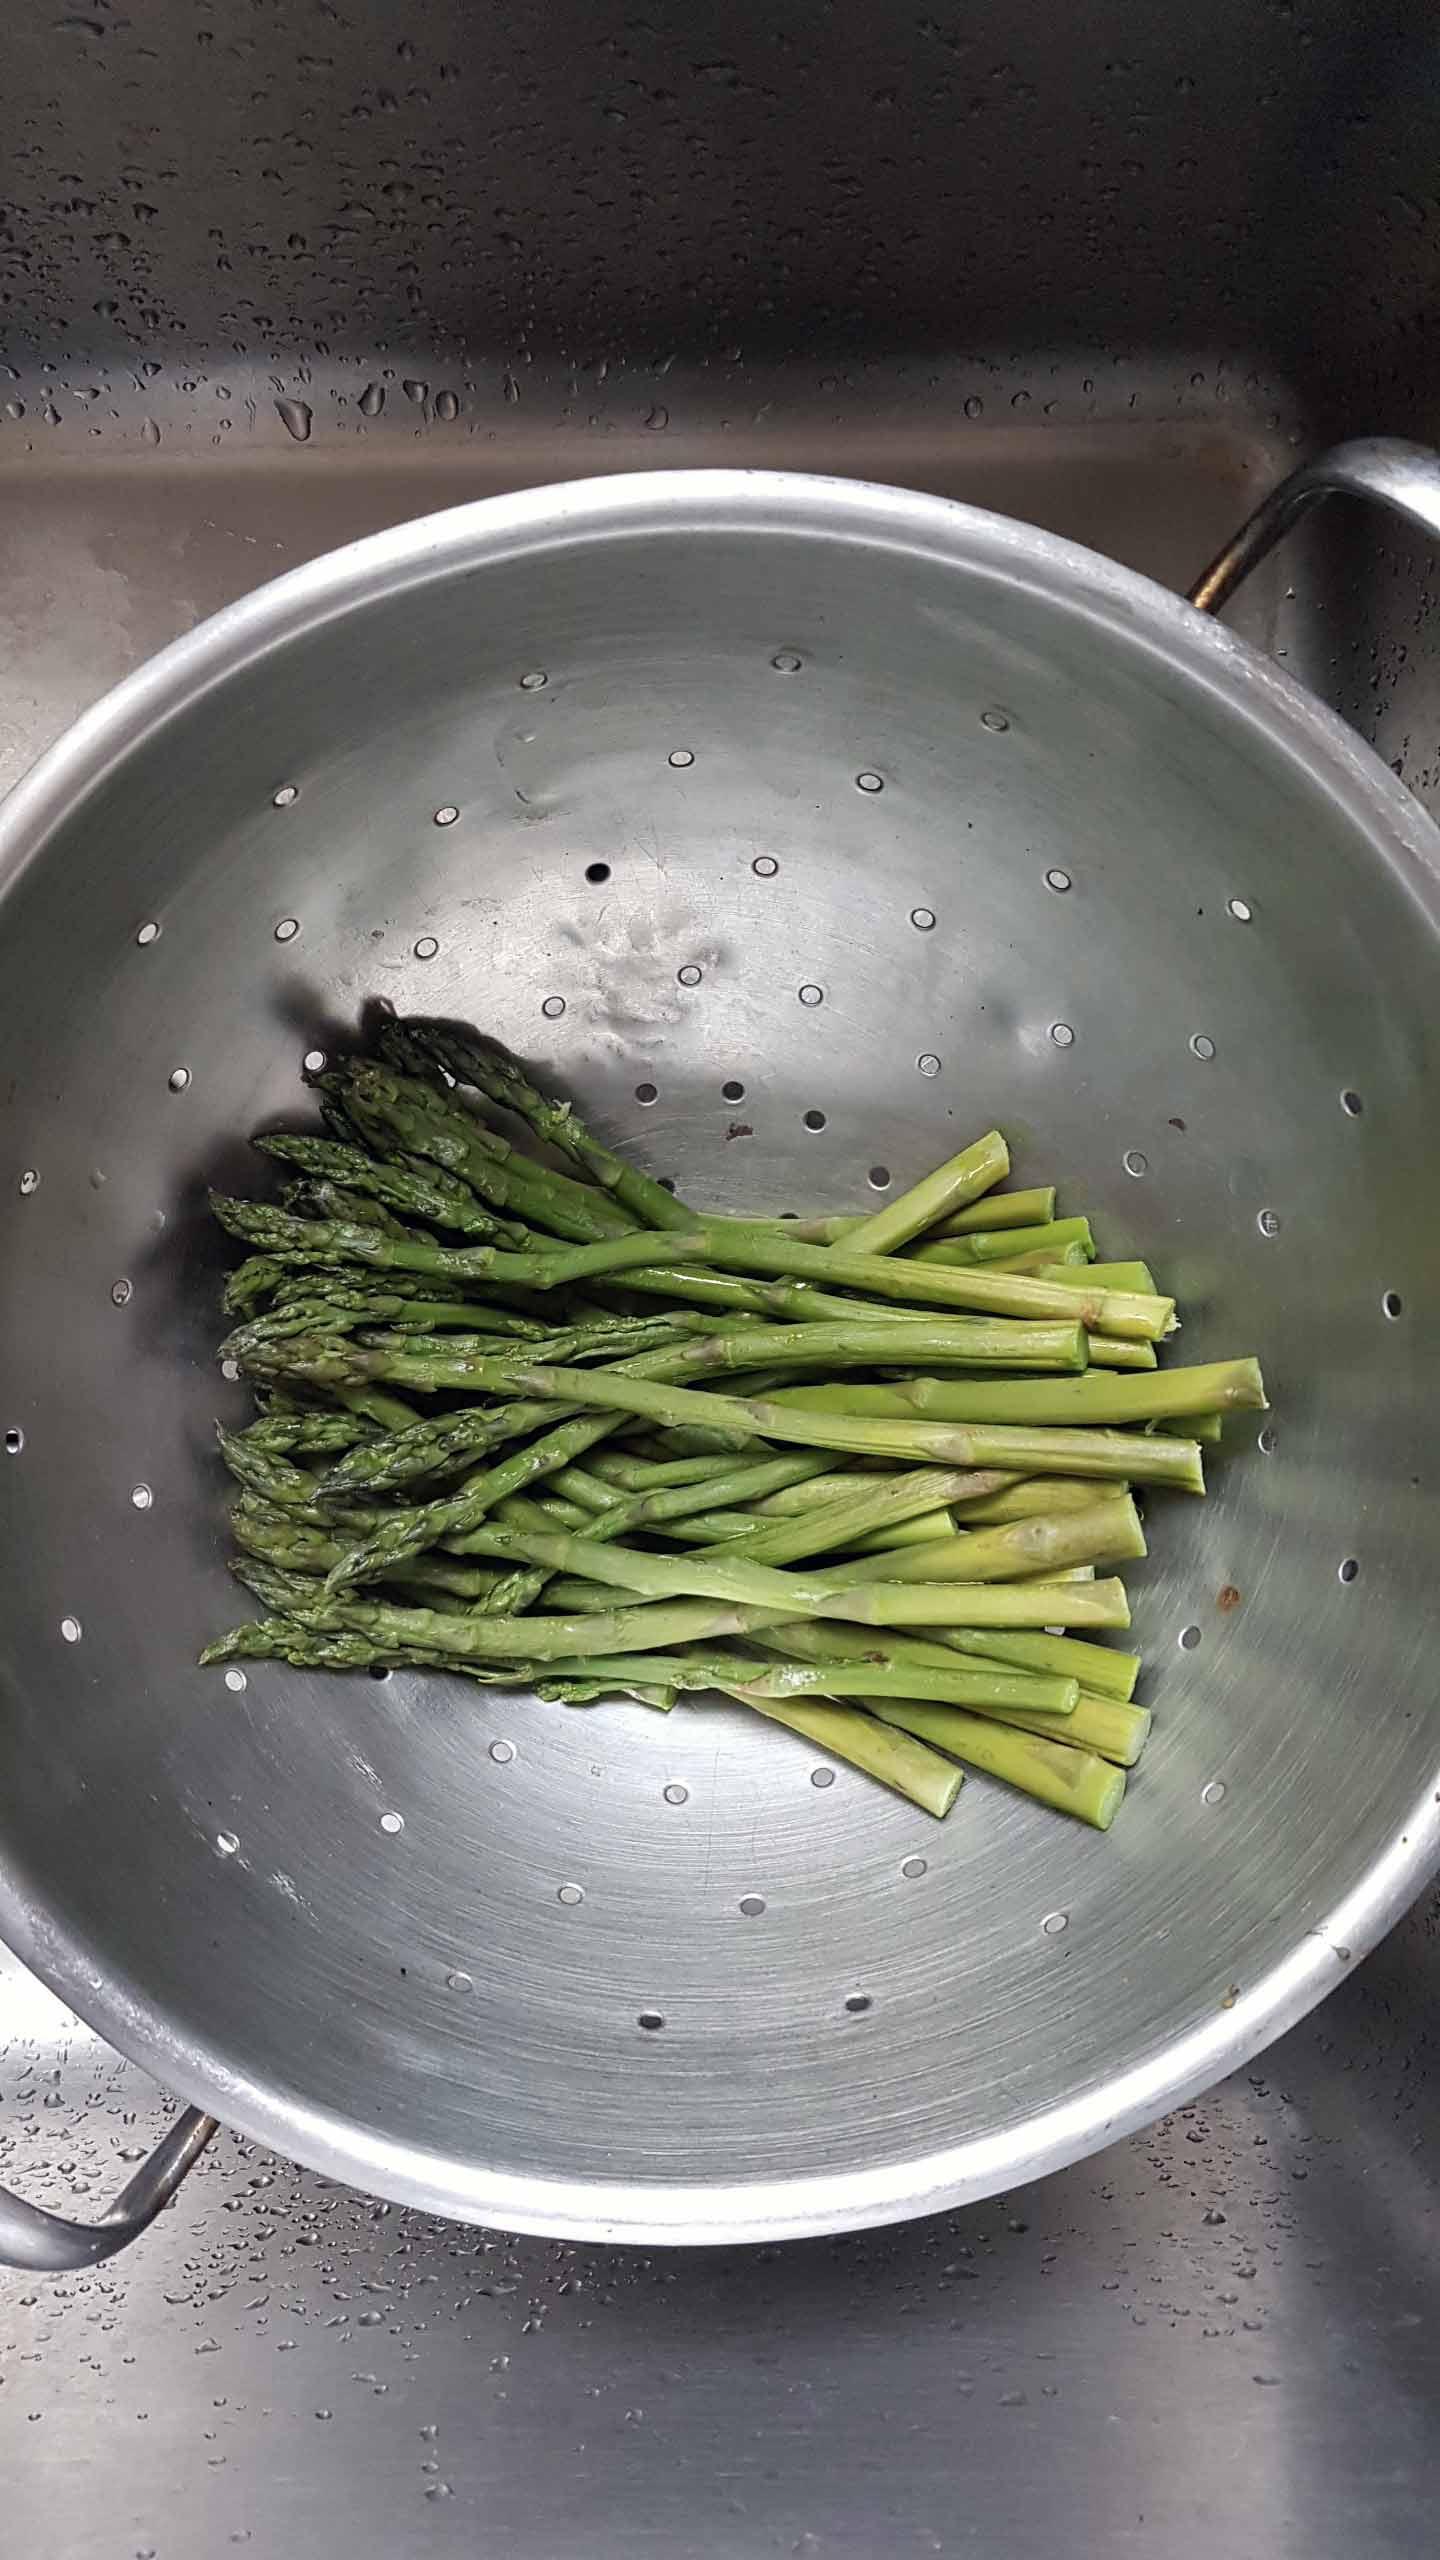 asparagi-nello-scolapasta